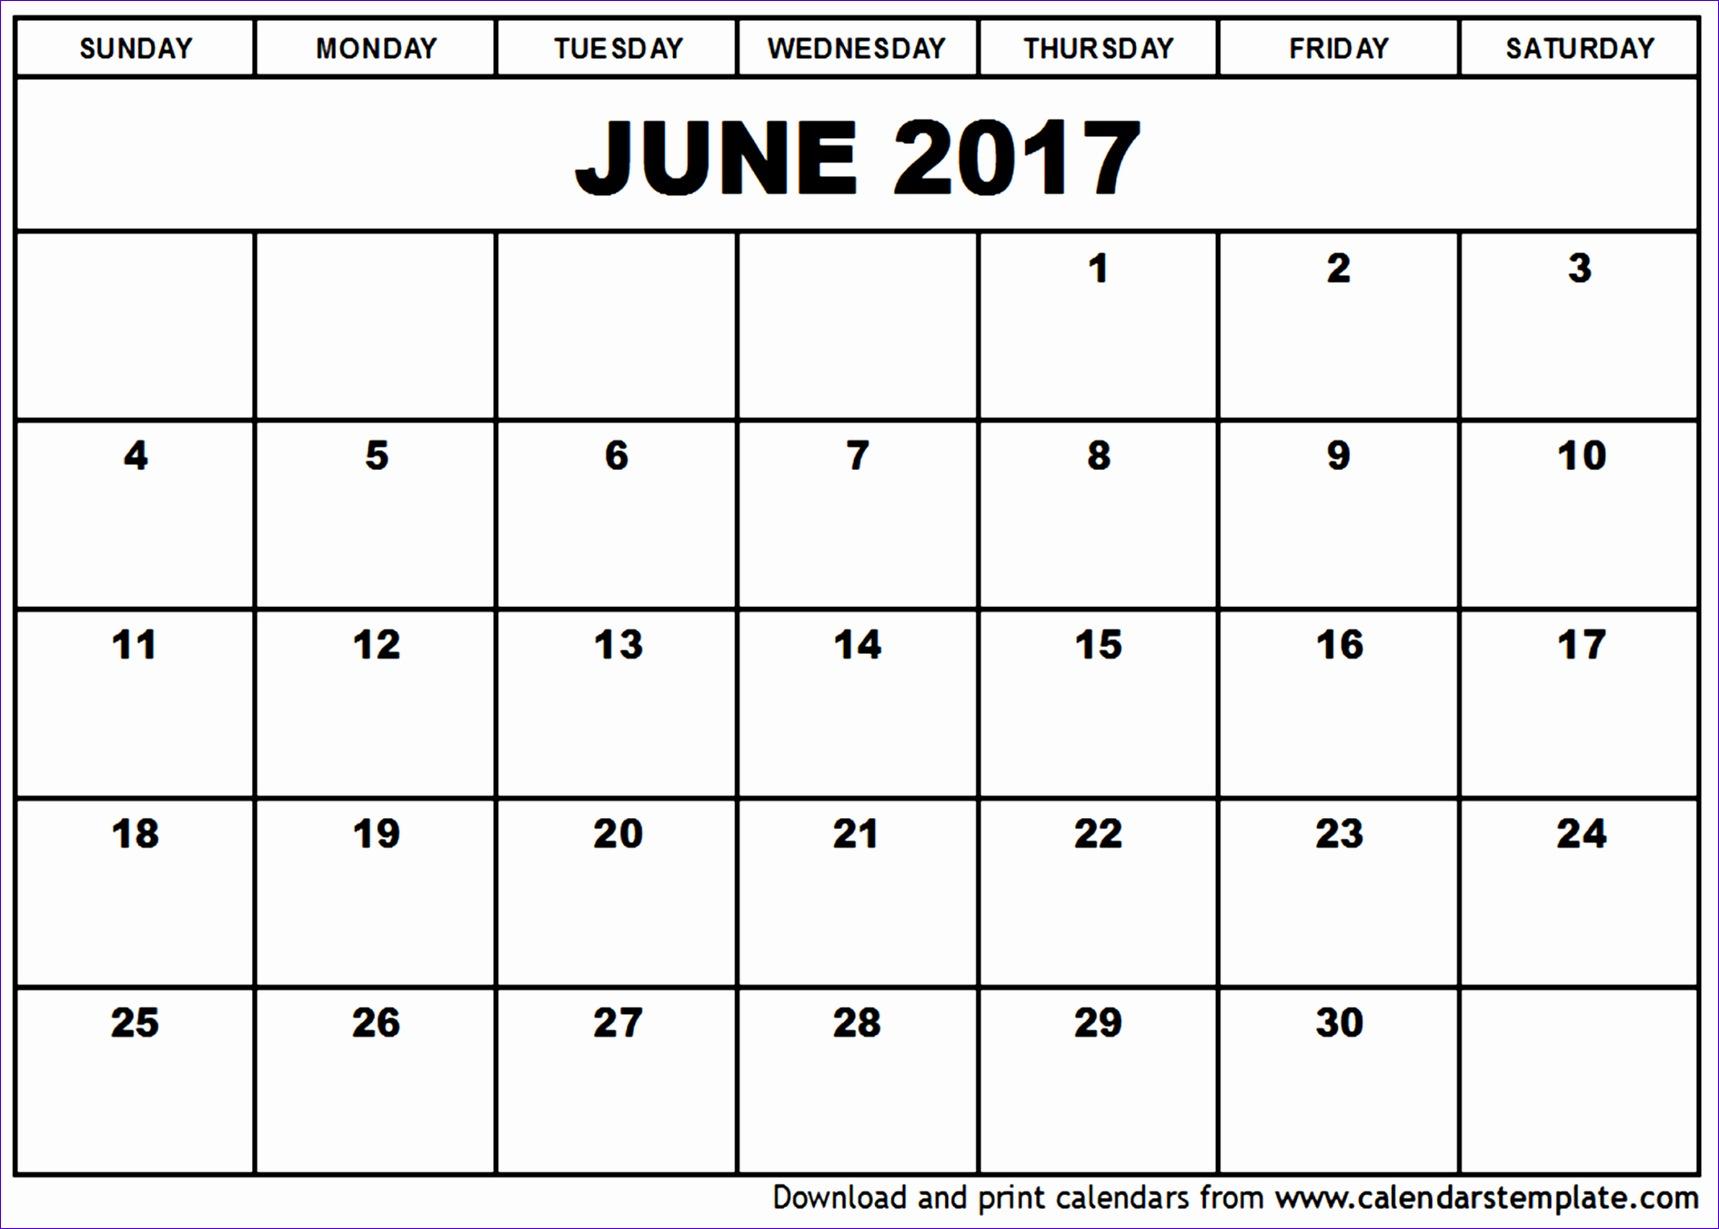 june 2017 printable calendar free pdf word excel templates example 17191229